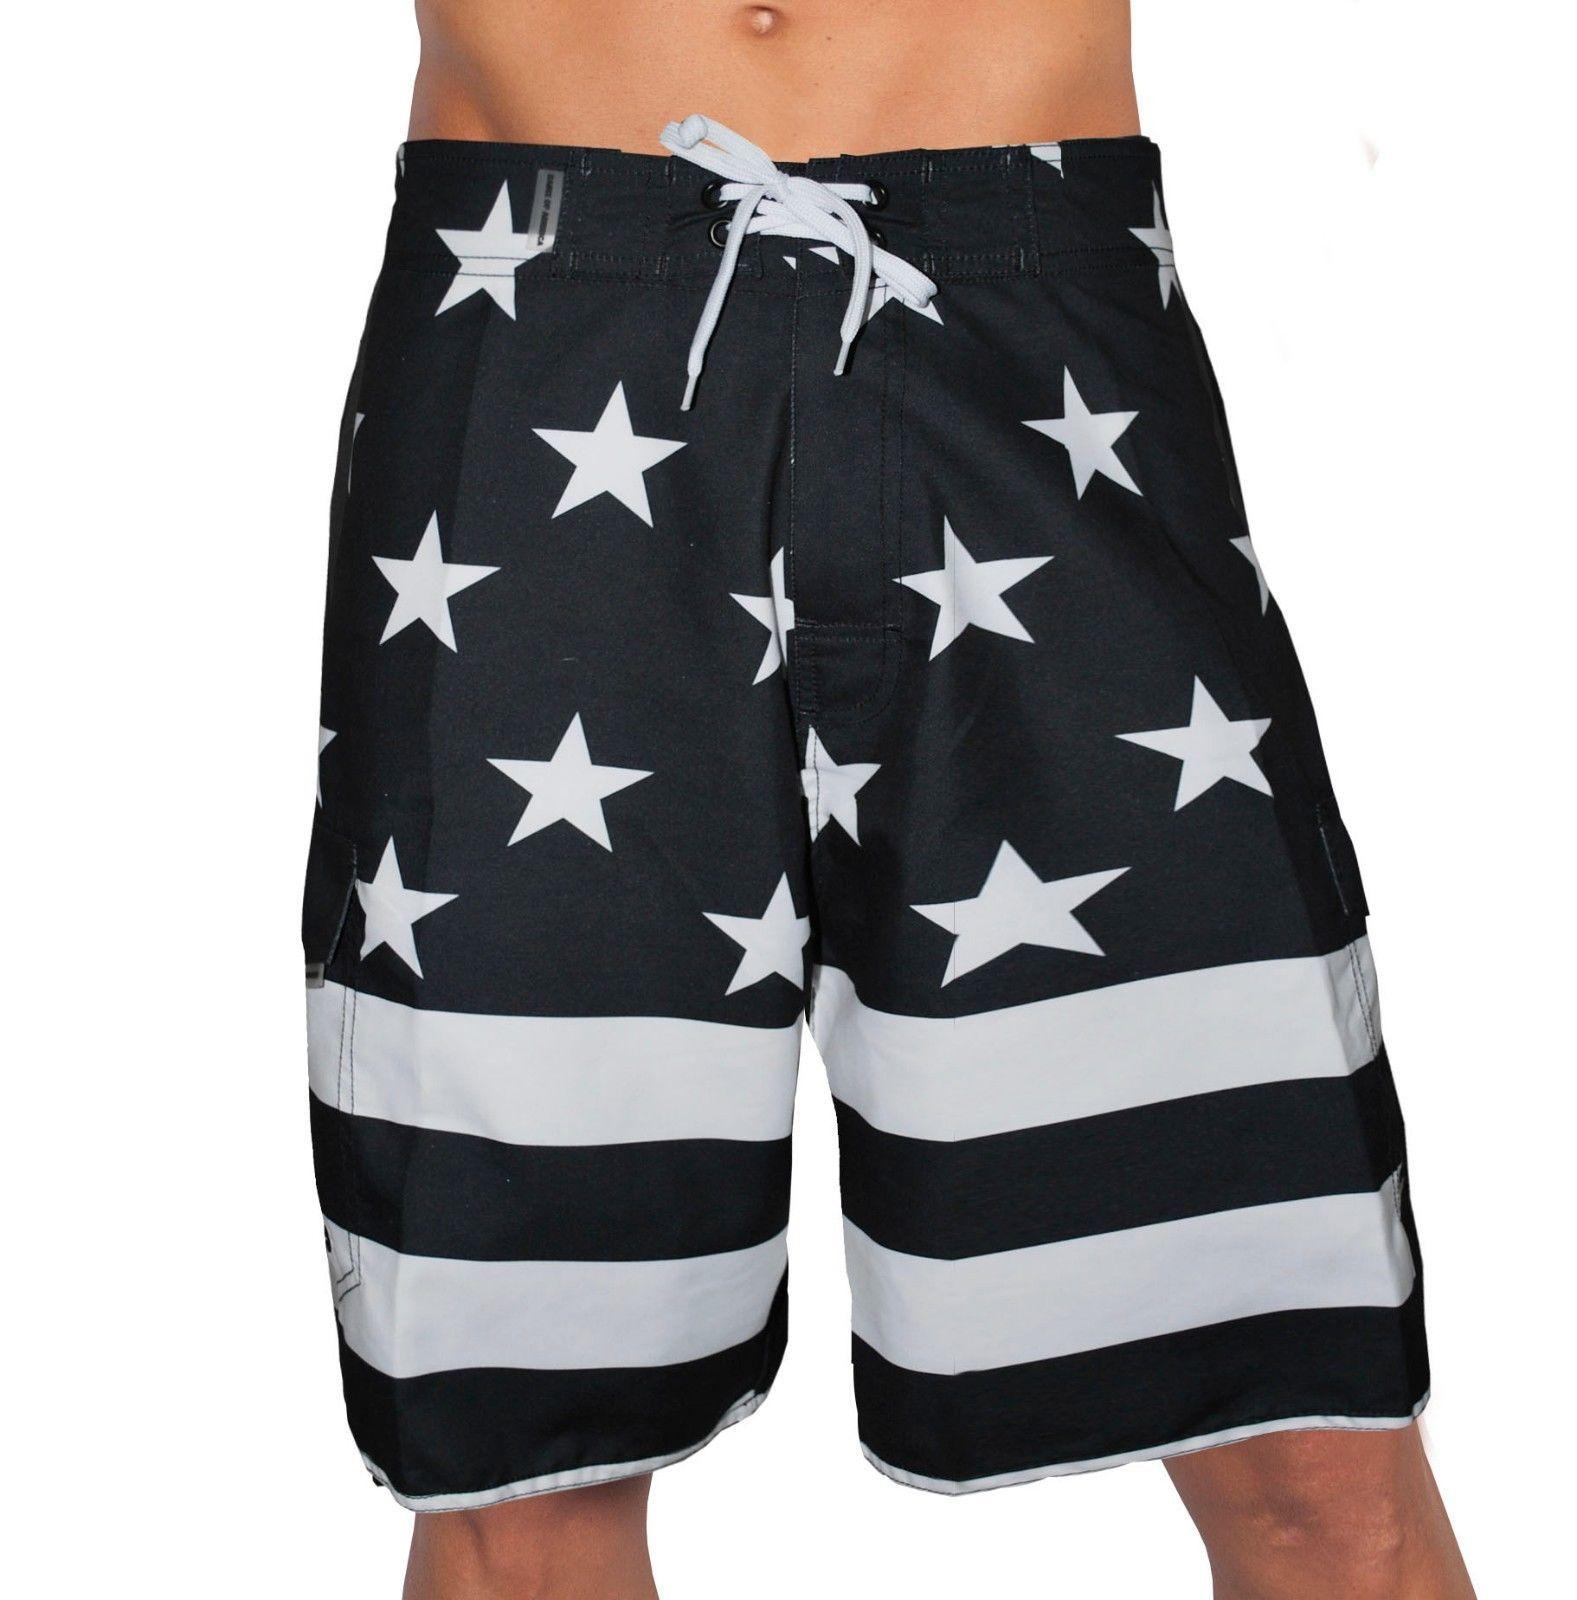 USA AMERICAN BLACK FLAG PATRIOTIC BOARD SHORTS FREEDOM ARMY AMERICA SWIM TRUNKS - $25.01